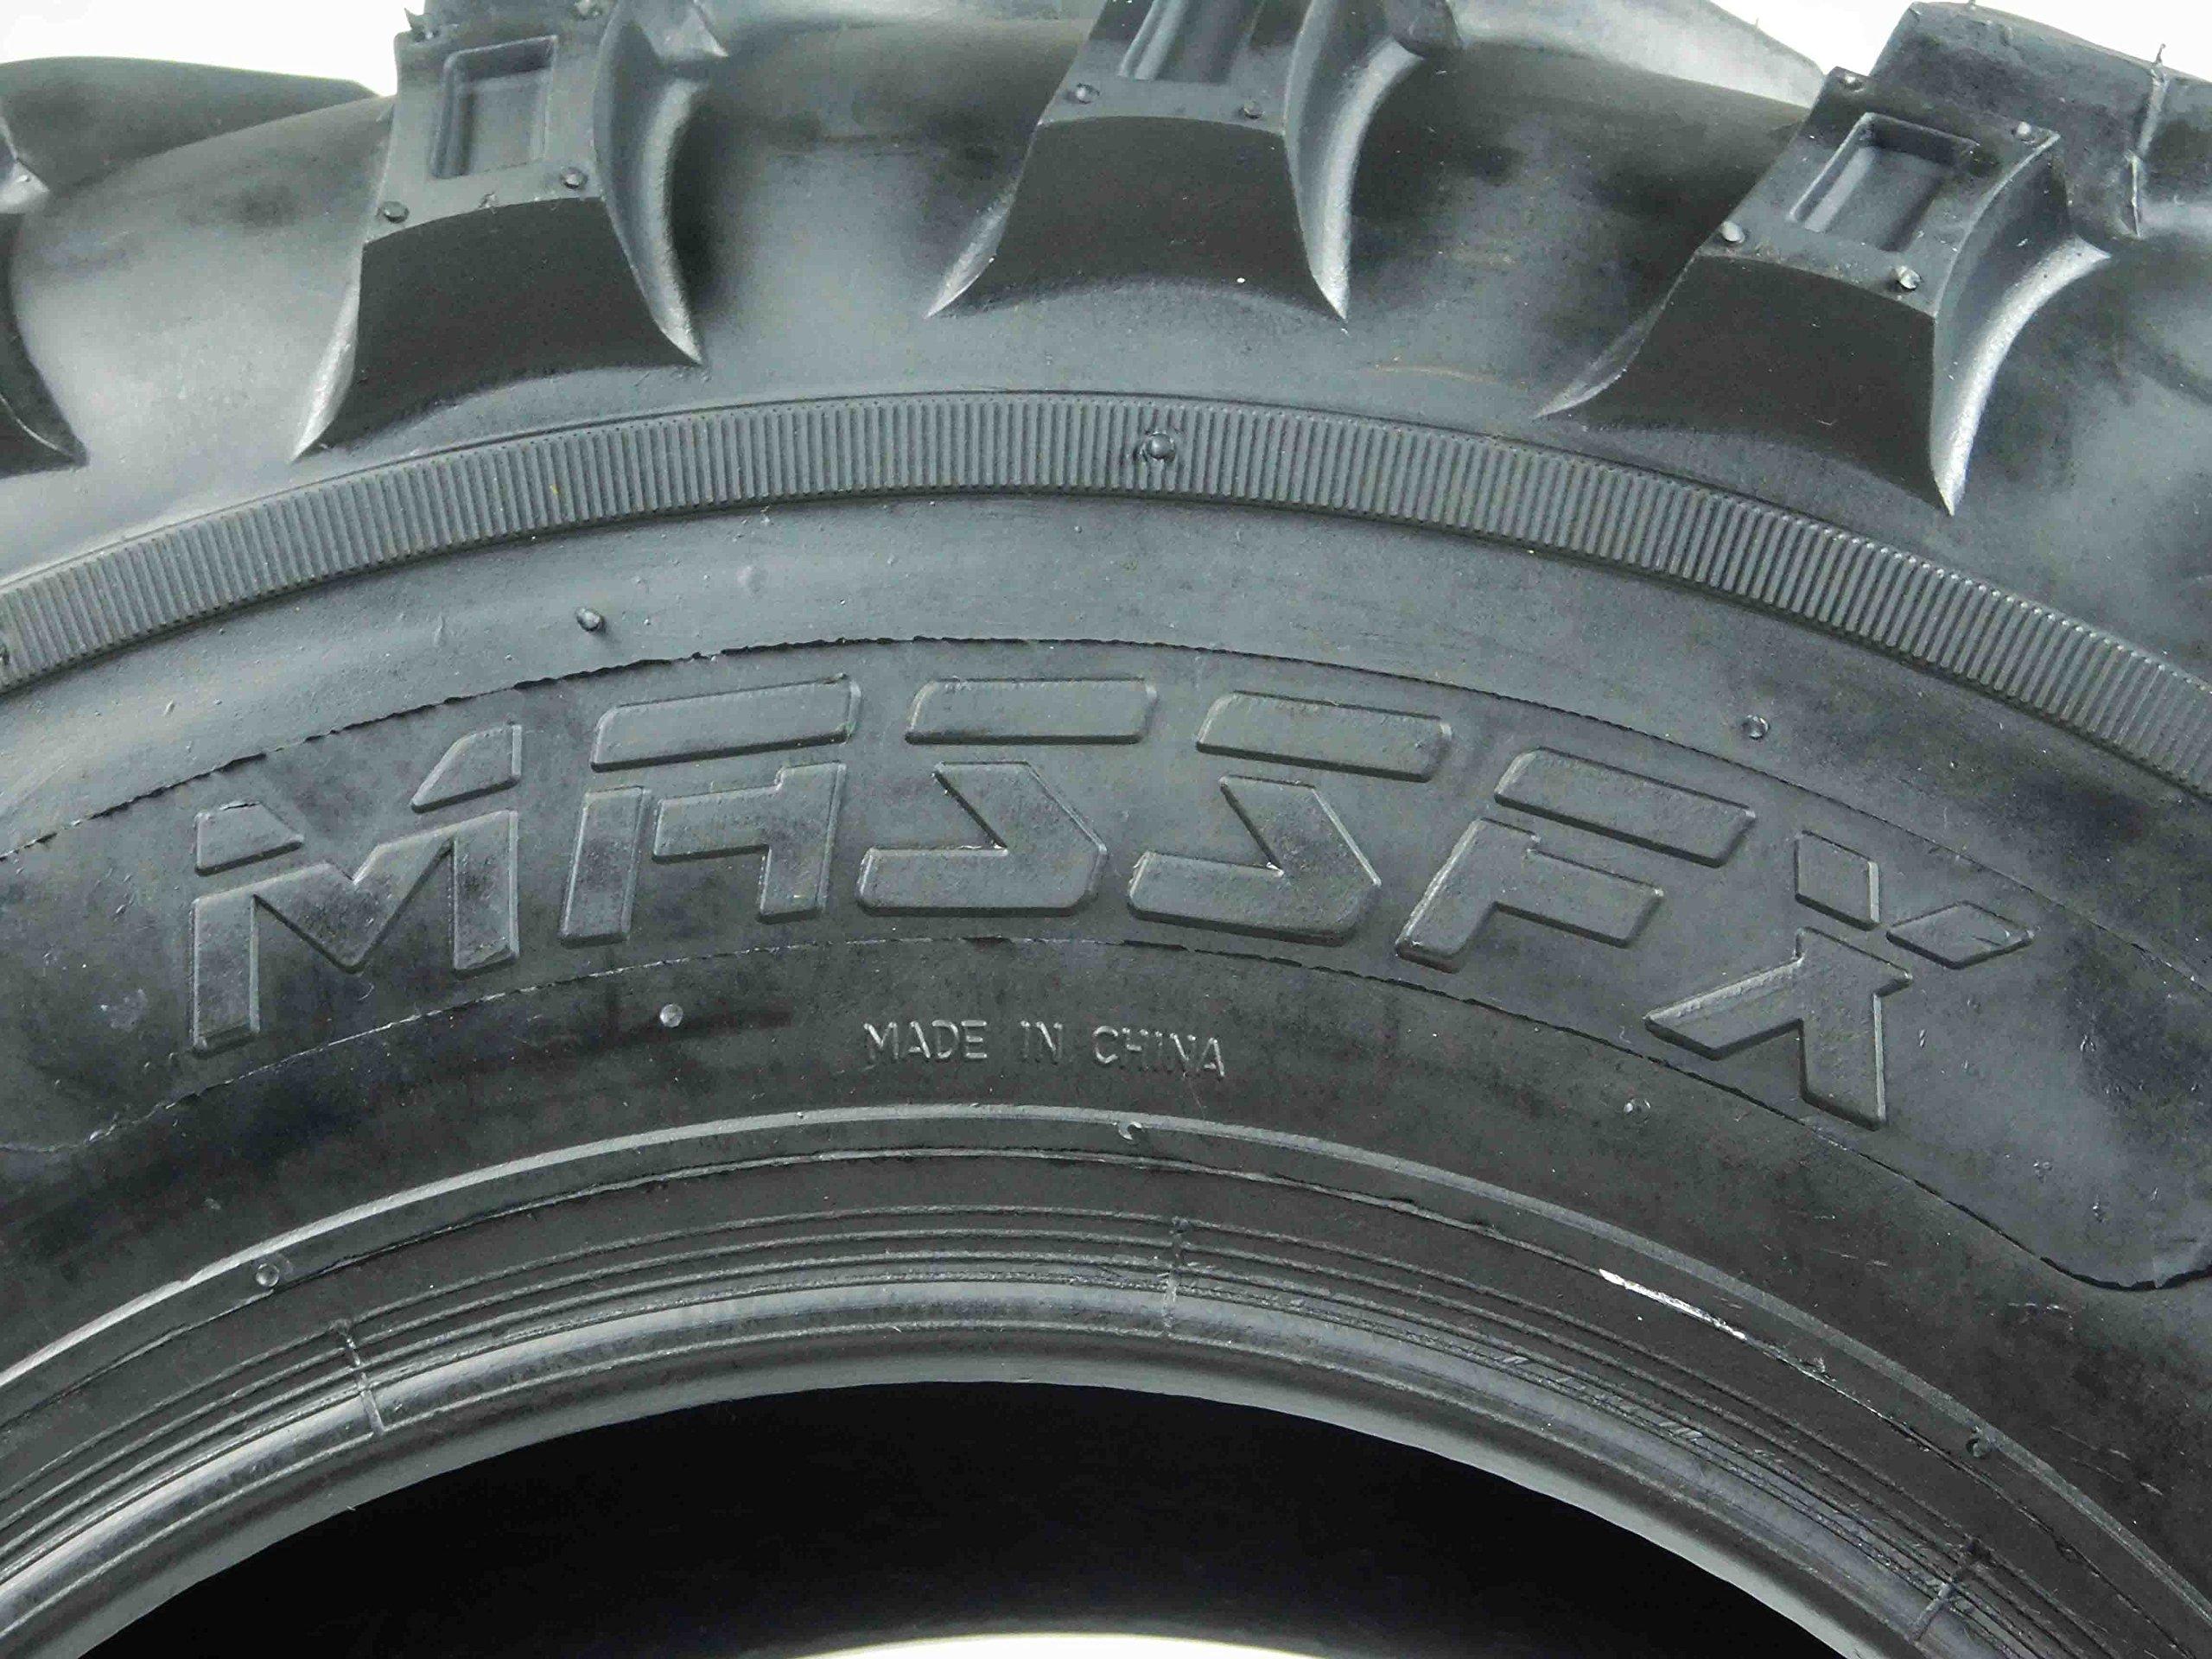 New Single MASSFX MS ATV/UTV Tire 26 x9-12 Front, 26x9x12 26x9/12 by MASSFX (Image #2)